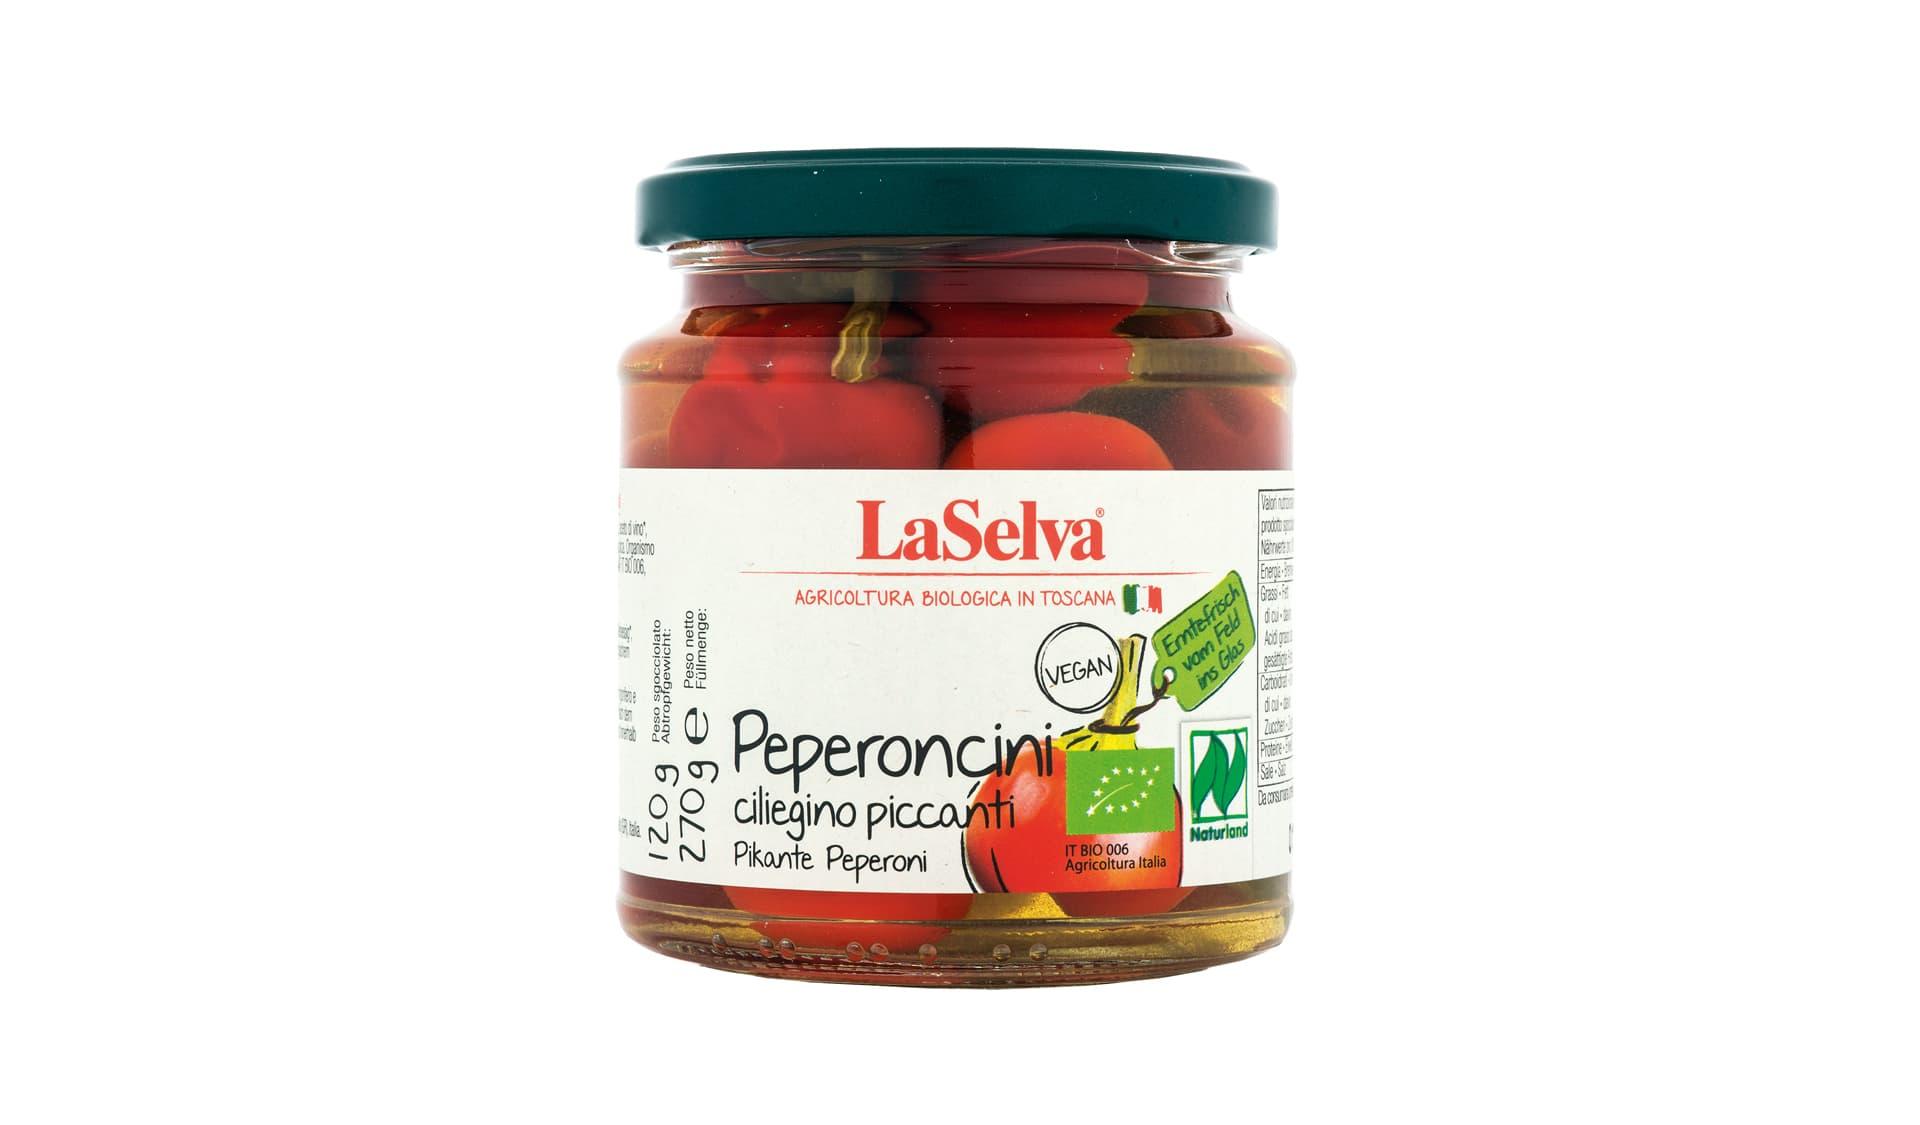 La Selva (www.laselva.bio) Pikante Peperoni